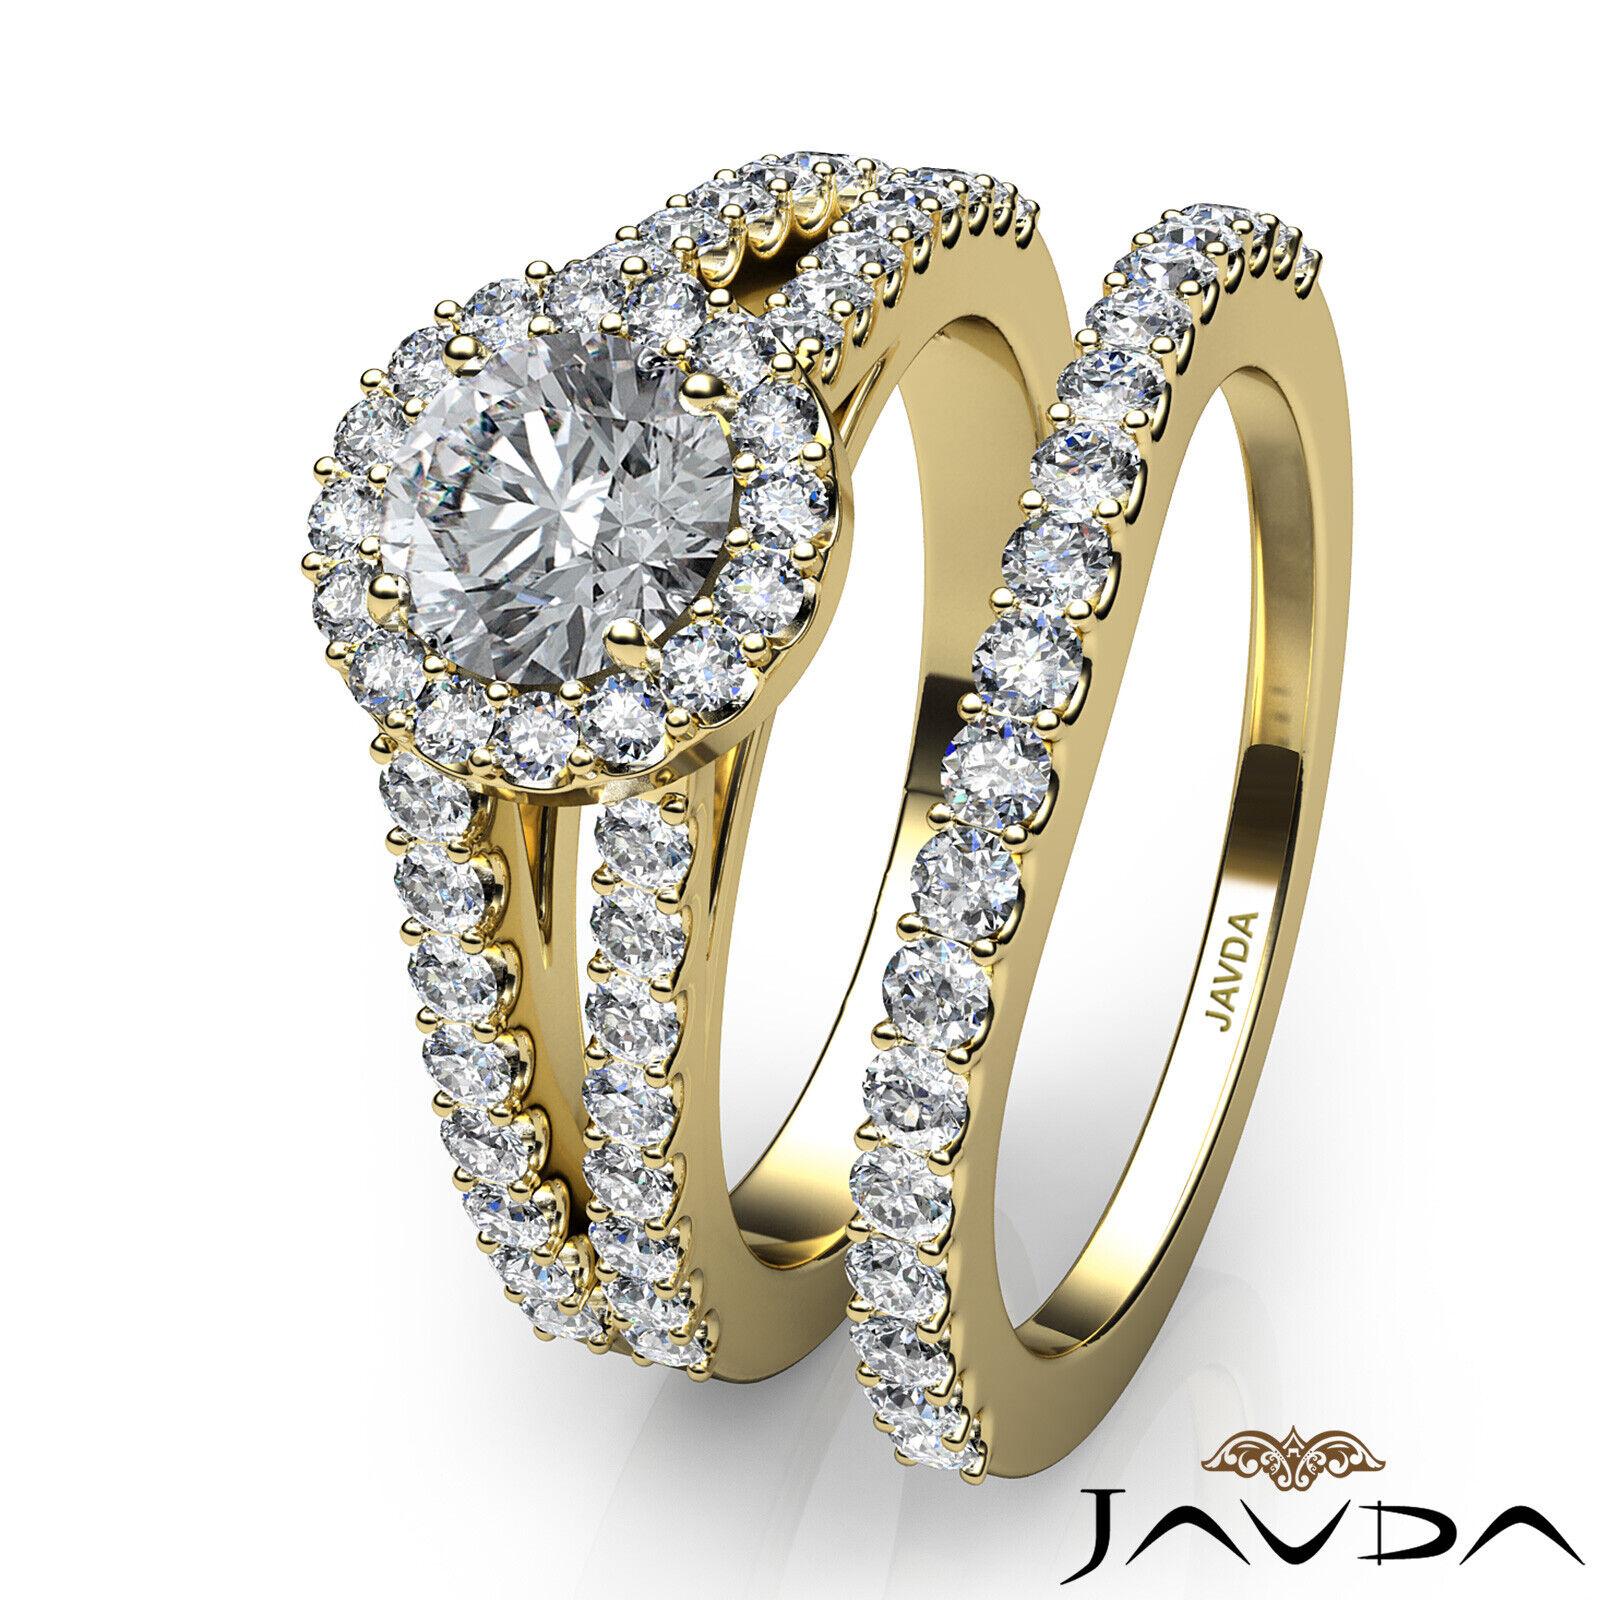 1.85ctw Luxurious Wedding Bridal Round Diamond Engagement Ring GIA G-VVS1 W Gold 11